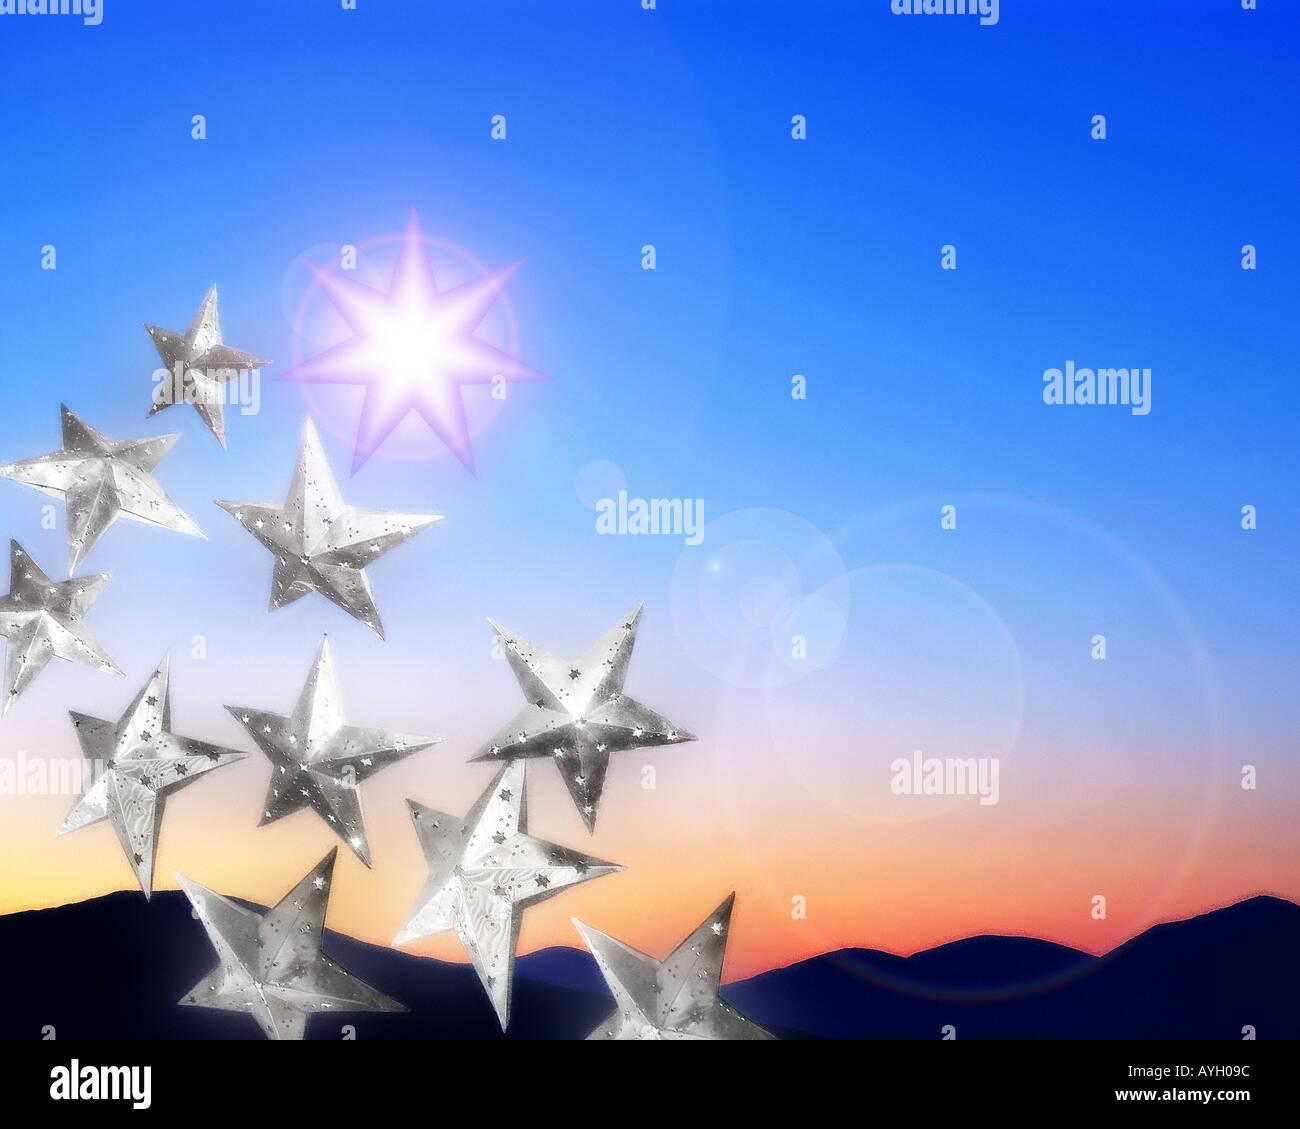 Arte digitale: Natale Design Immagini Stock